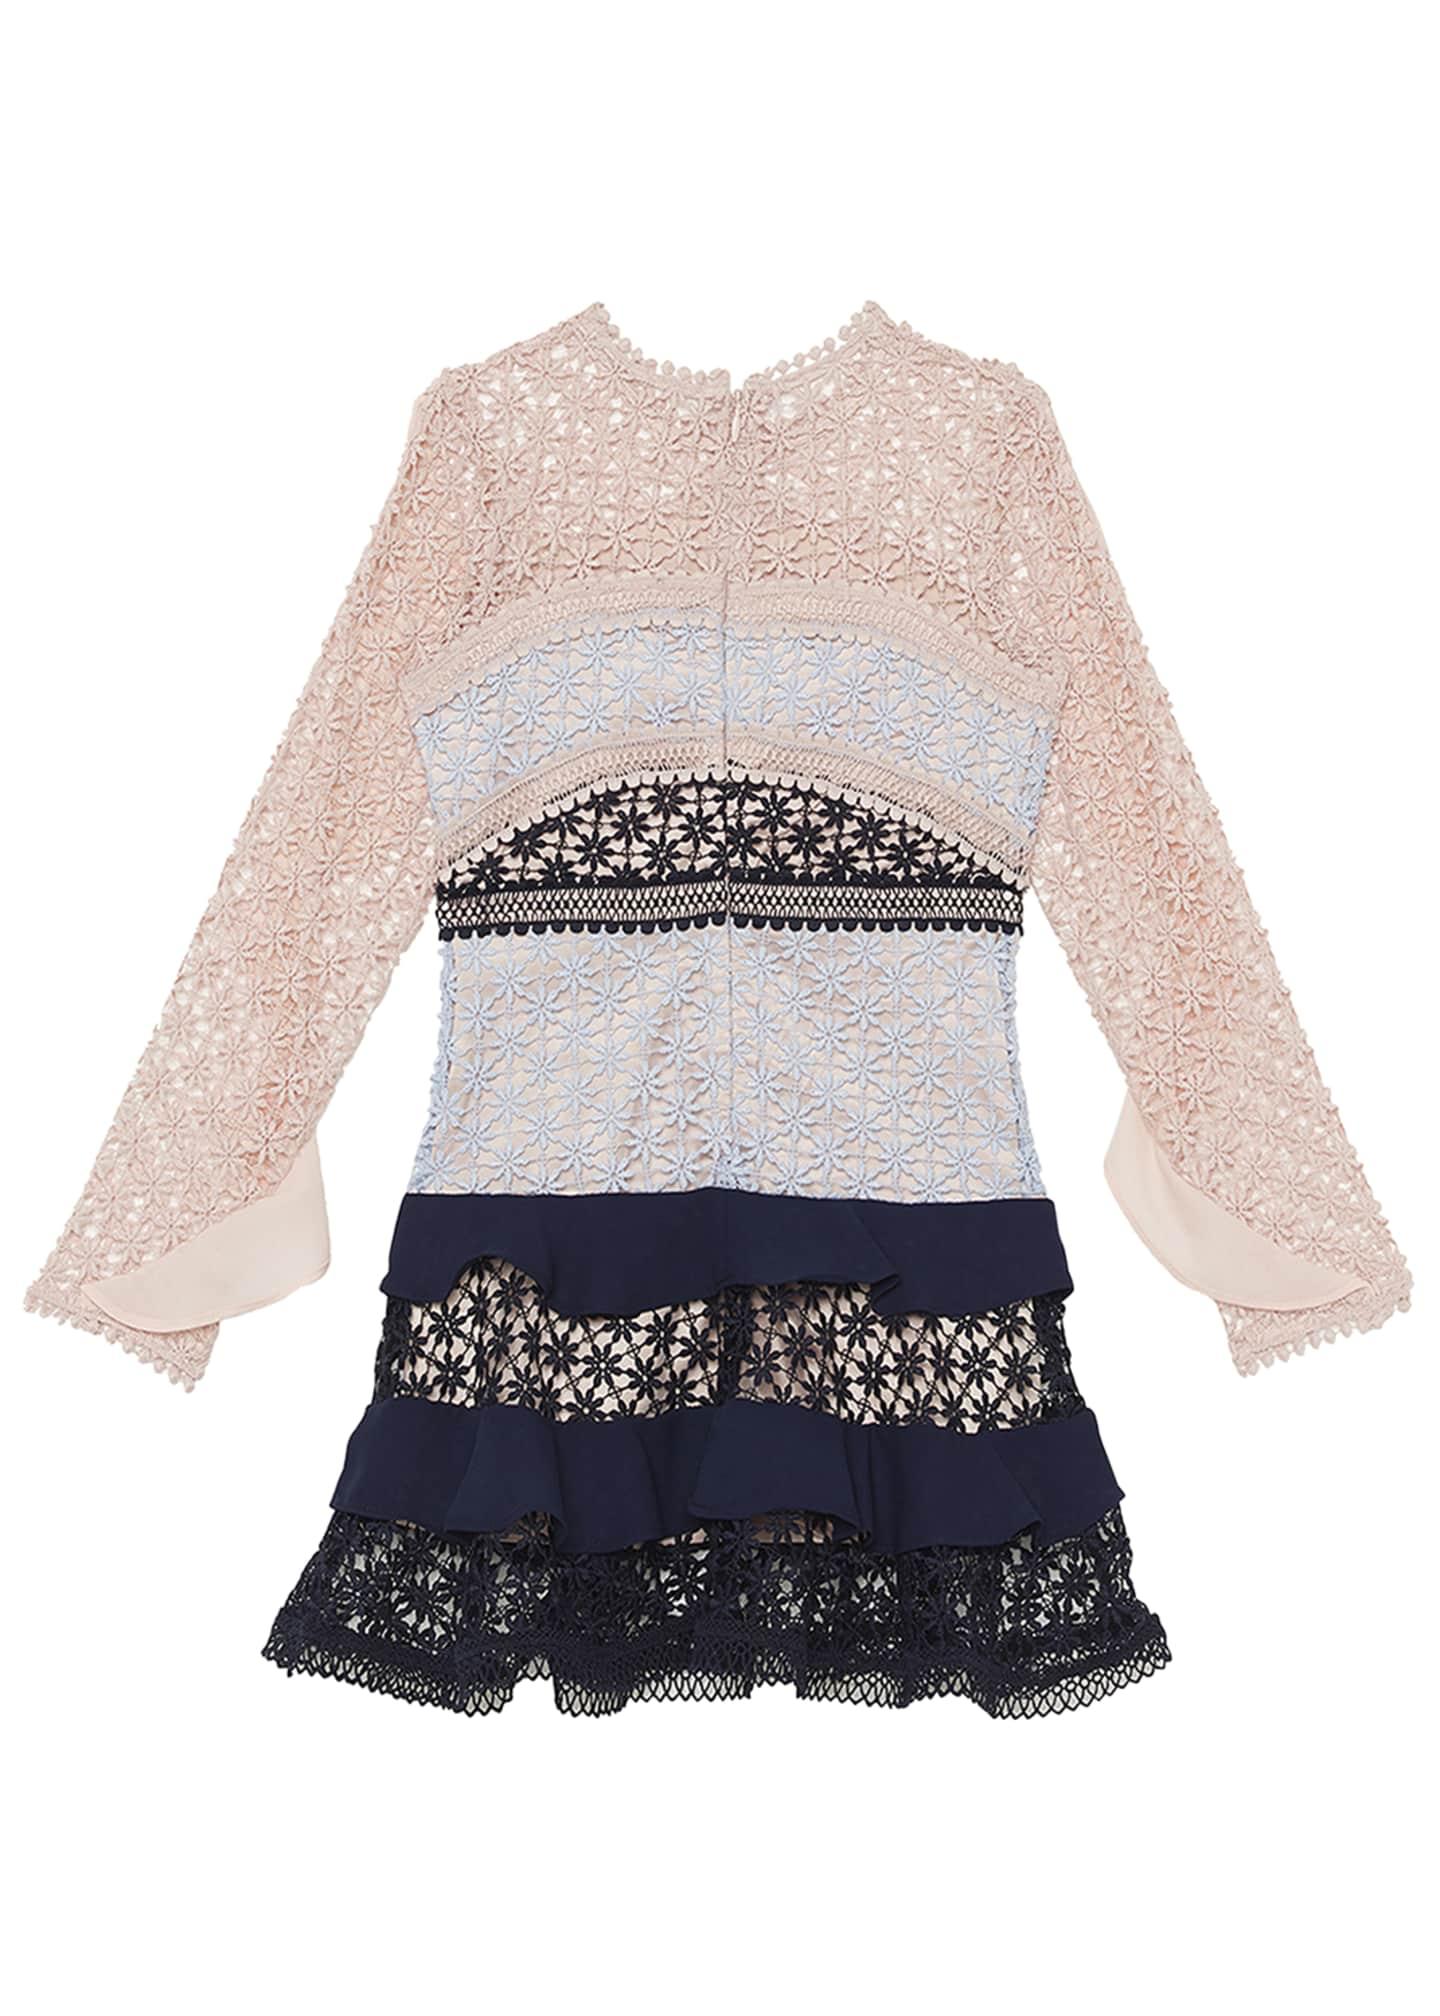 Bardot Junior Arabella Lace Dress, Size 7-16